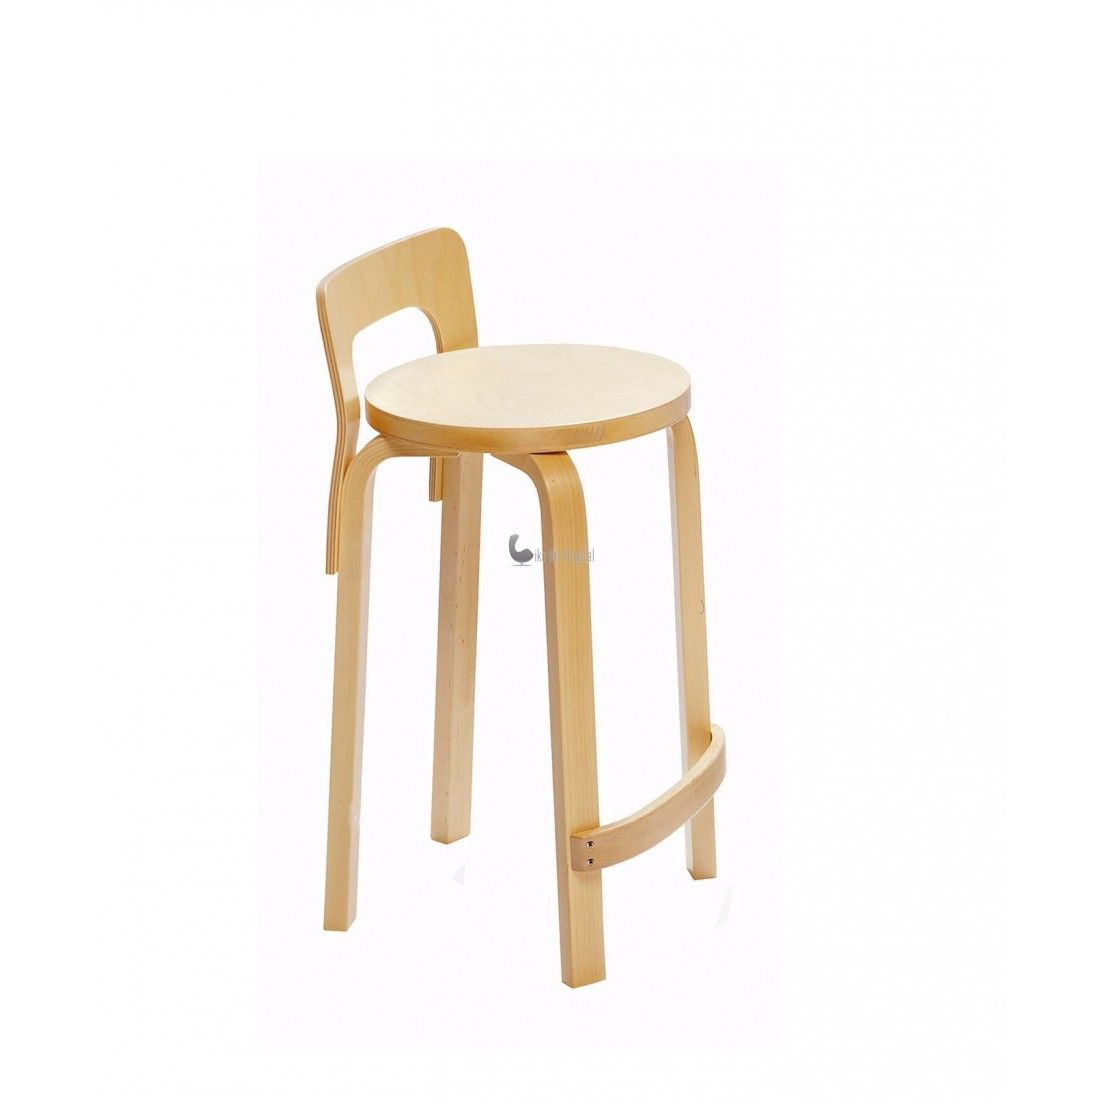 Aalto replica with replica design meubels for Replica design meubelen